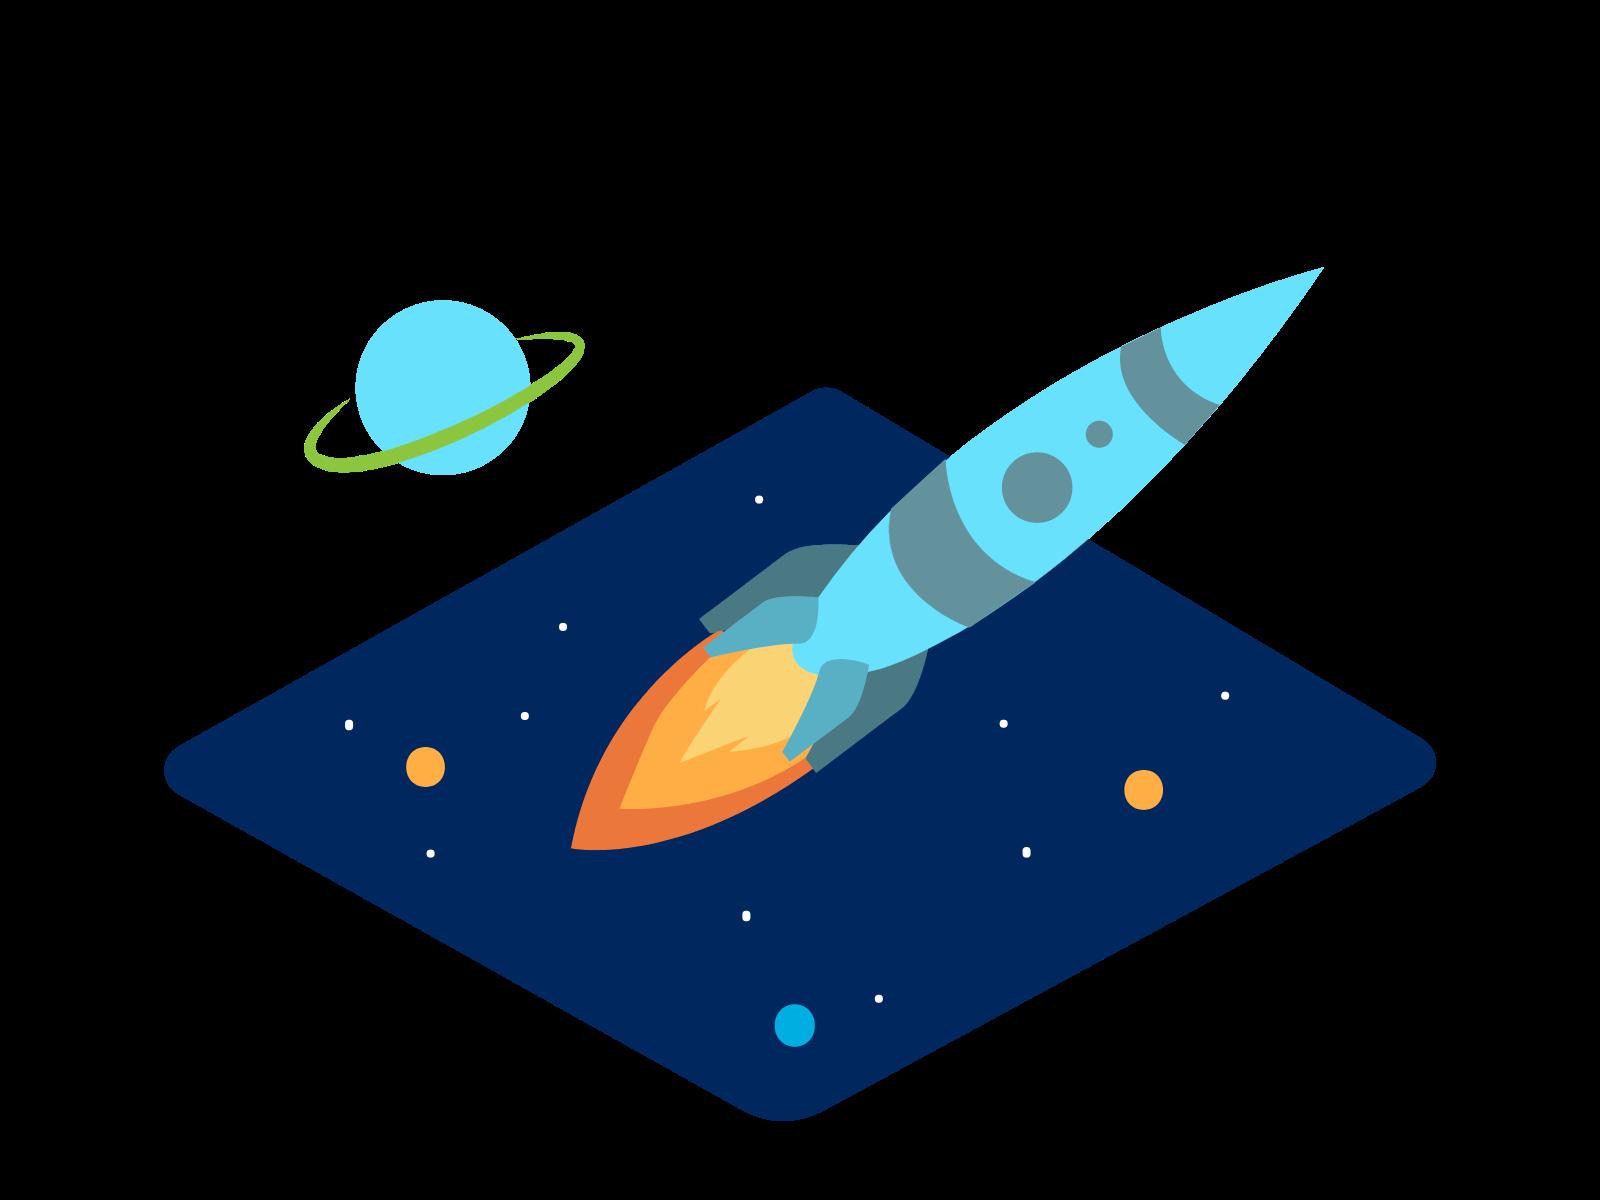 rocket_launch_